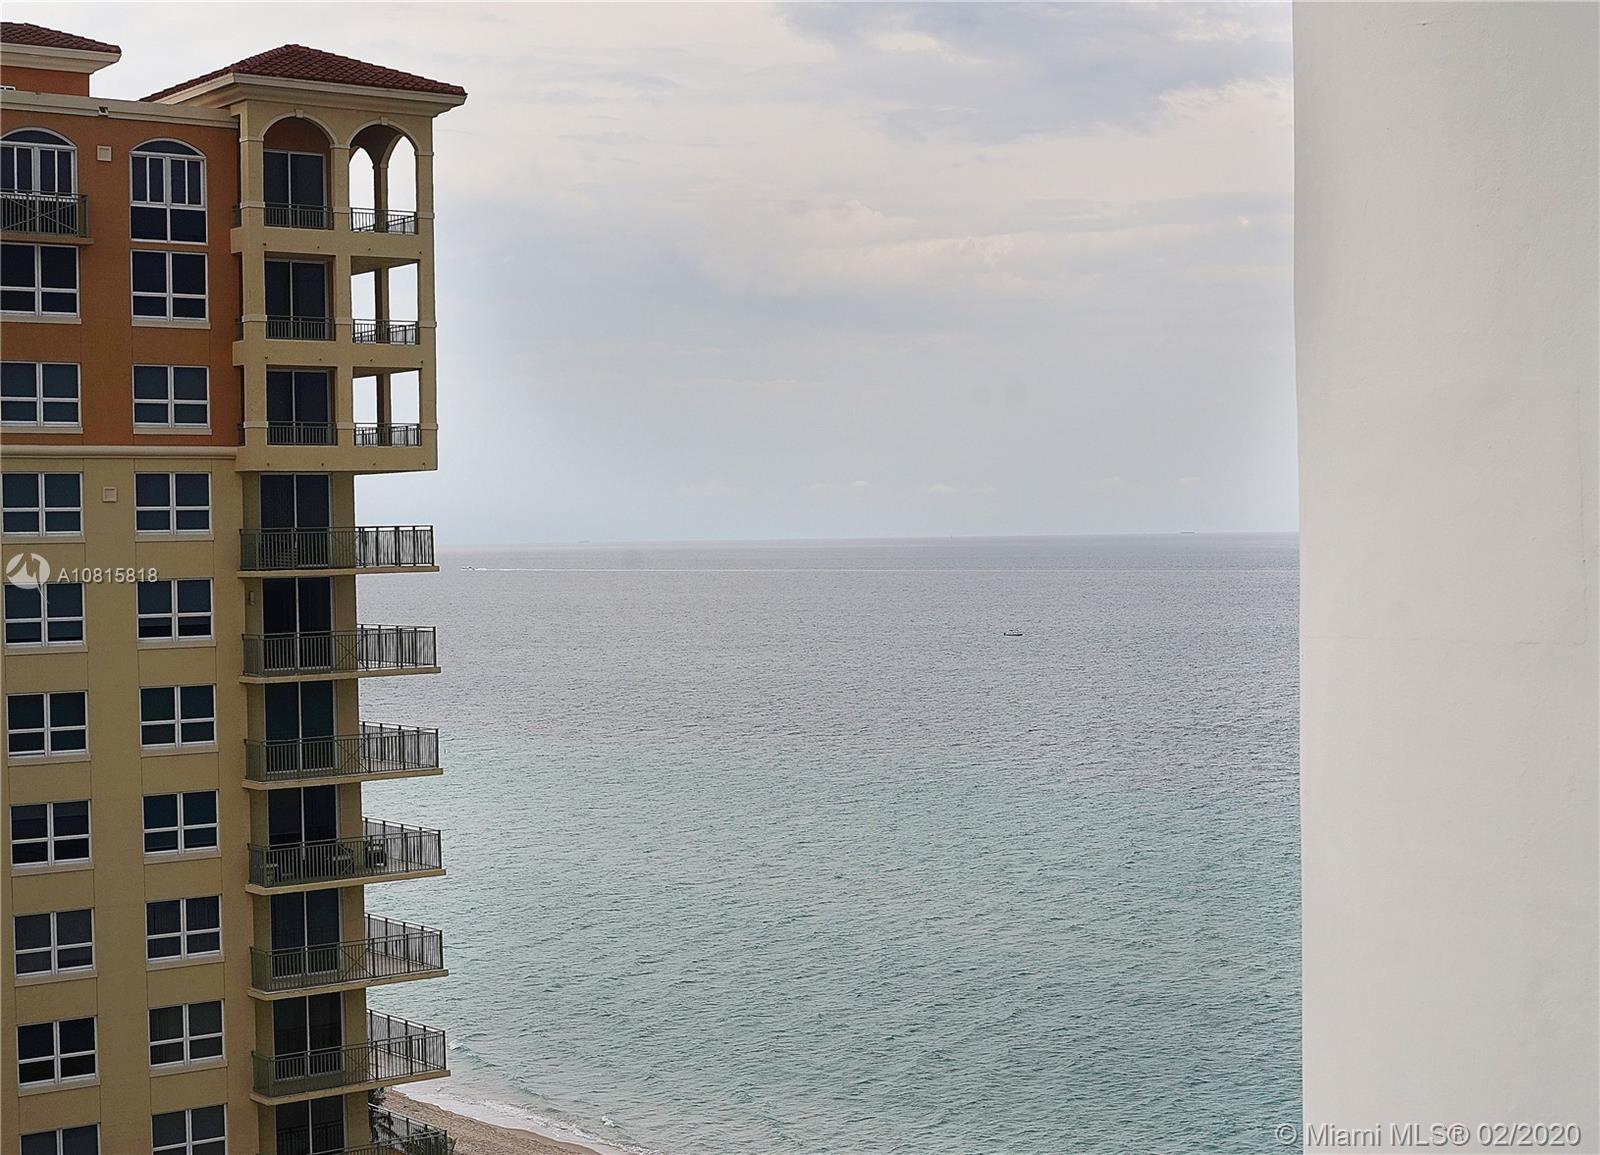 3140 S Ocean Drive #1607 For Sale A10815818, FL